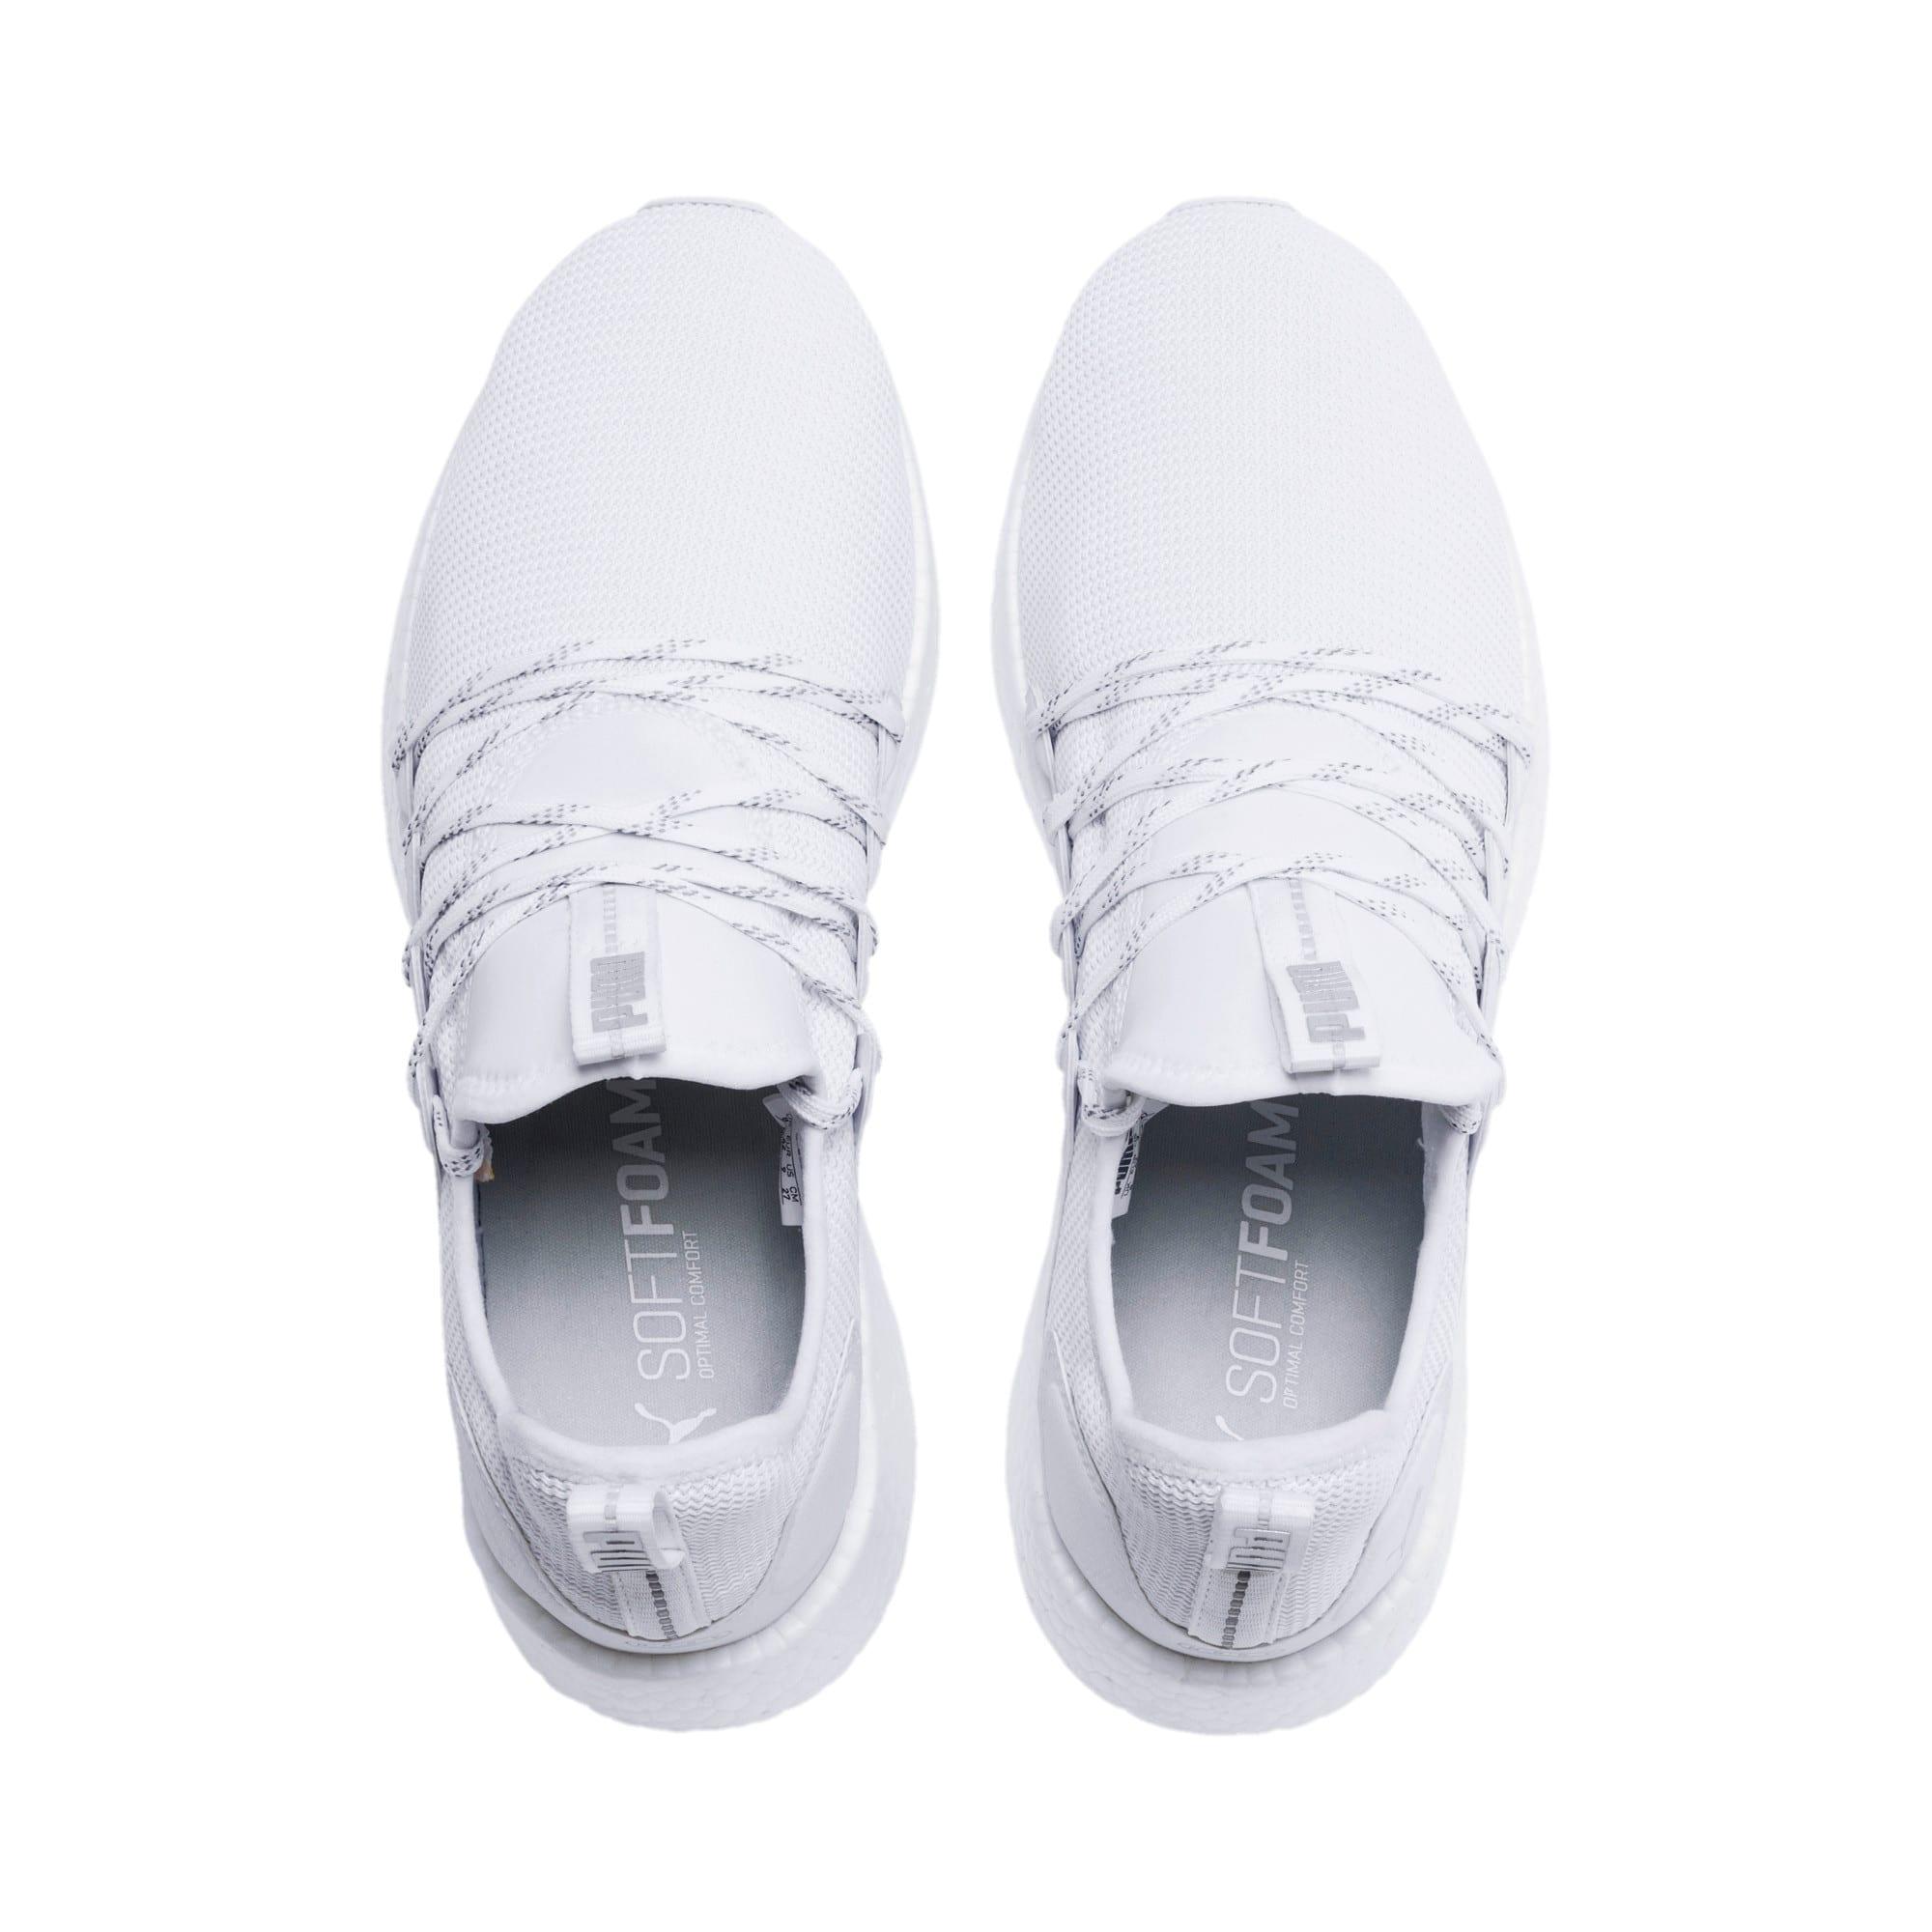 Thumbnail 7 of NRGY Neko Lights Men's Running Shoes, Puma White, medium